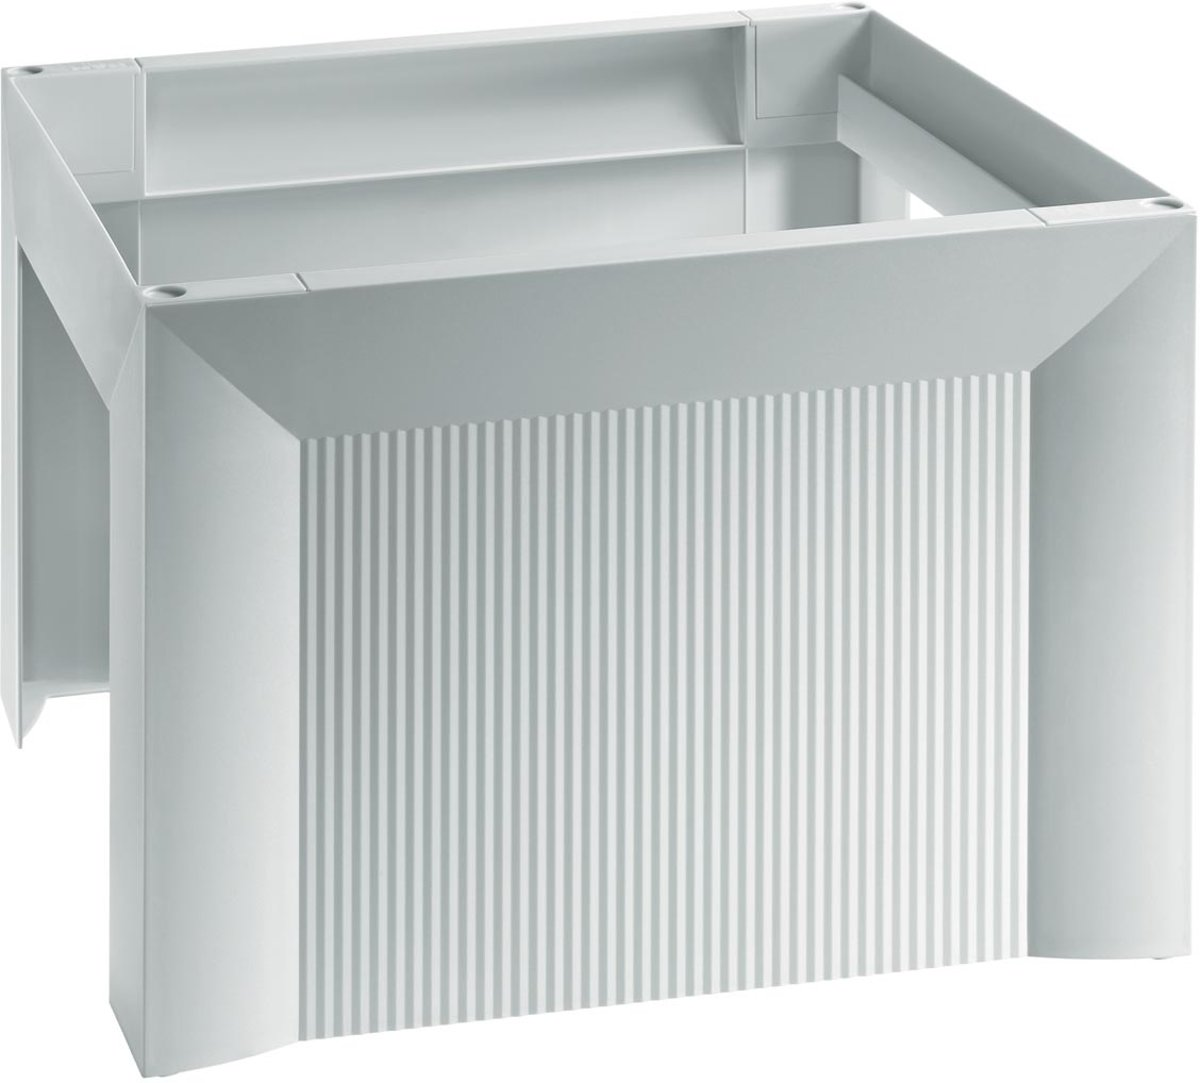 HAN Ladebox Impuls 1010-X-13 Zwart DIN A4, DIN C4 Aantal lades: 4